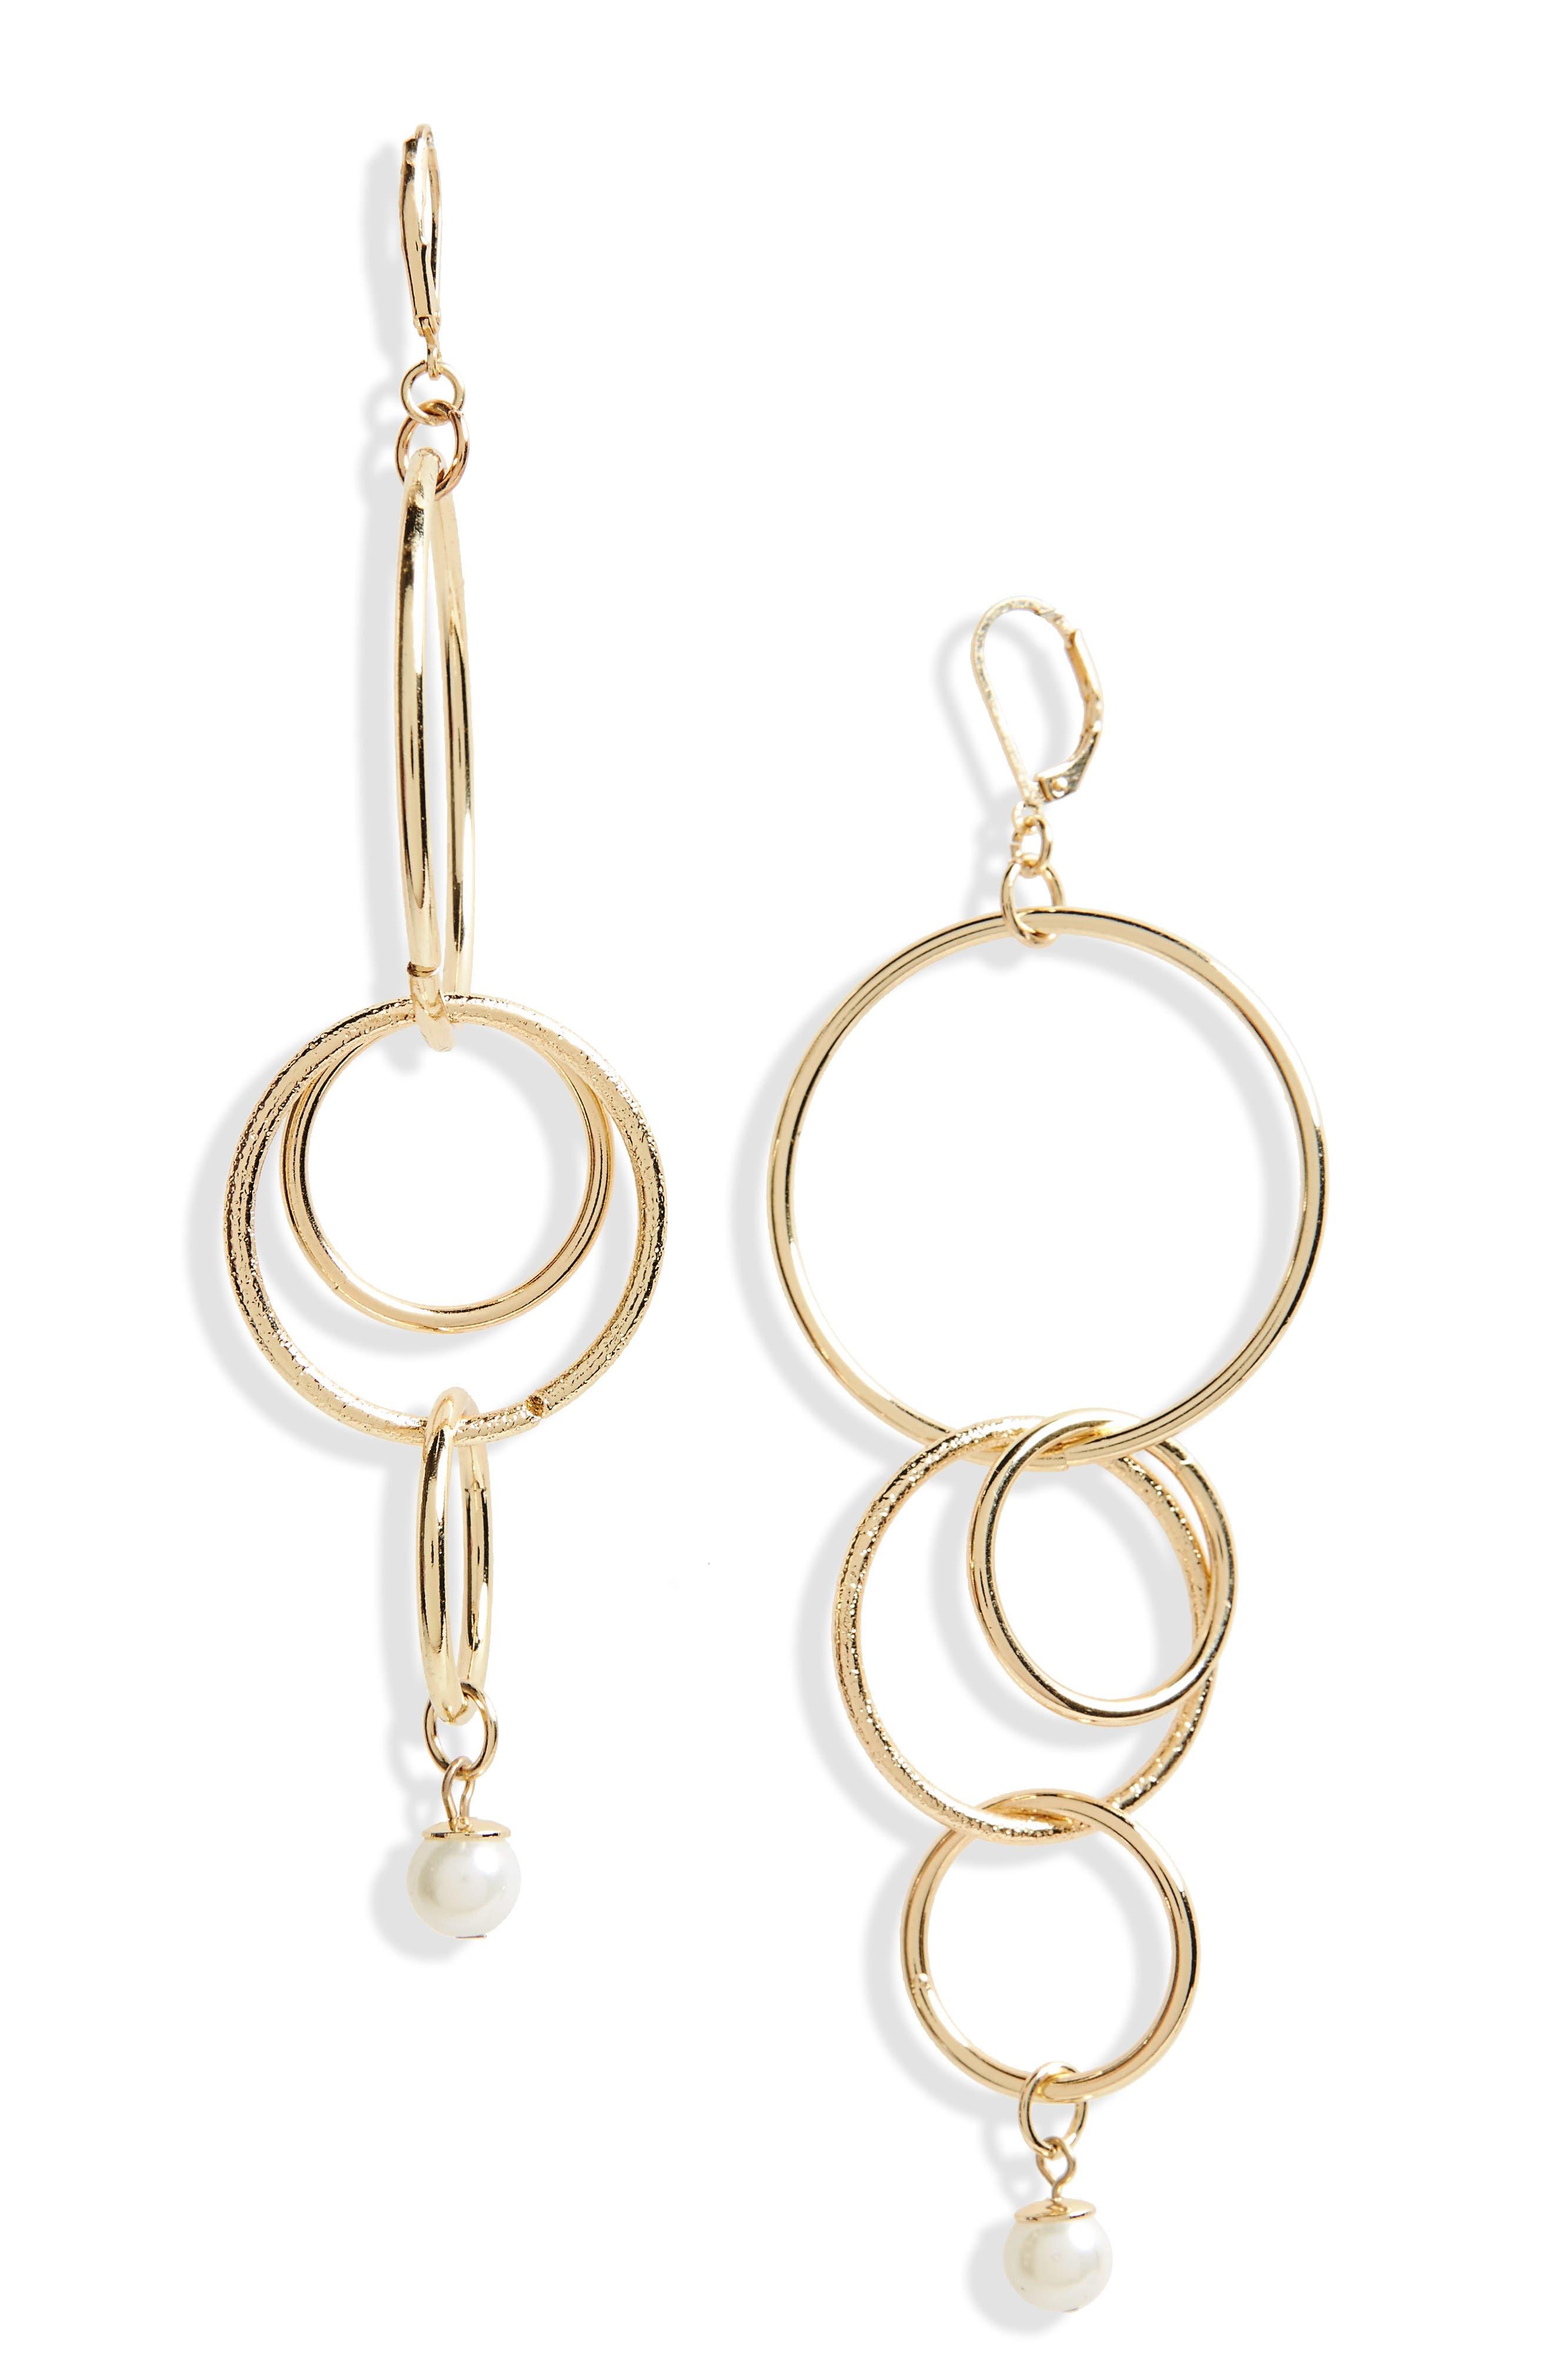 Multi Linked Imitation Pearl Hoop Earrings,                             Main thumbnail 1, color,                             Gold